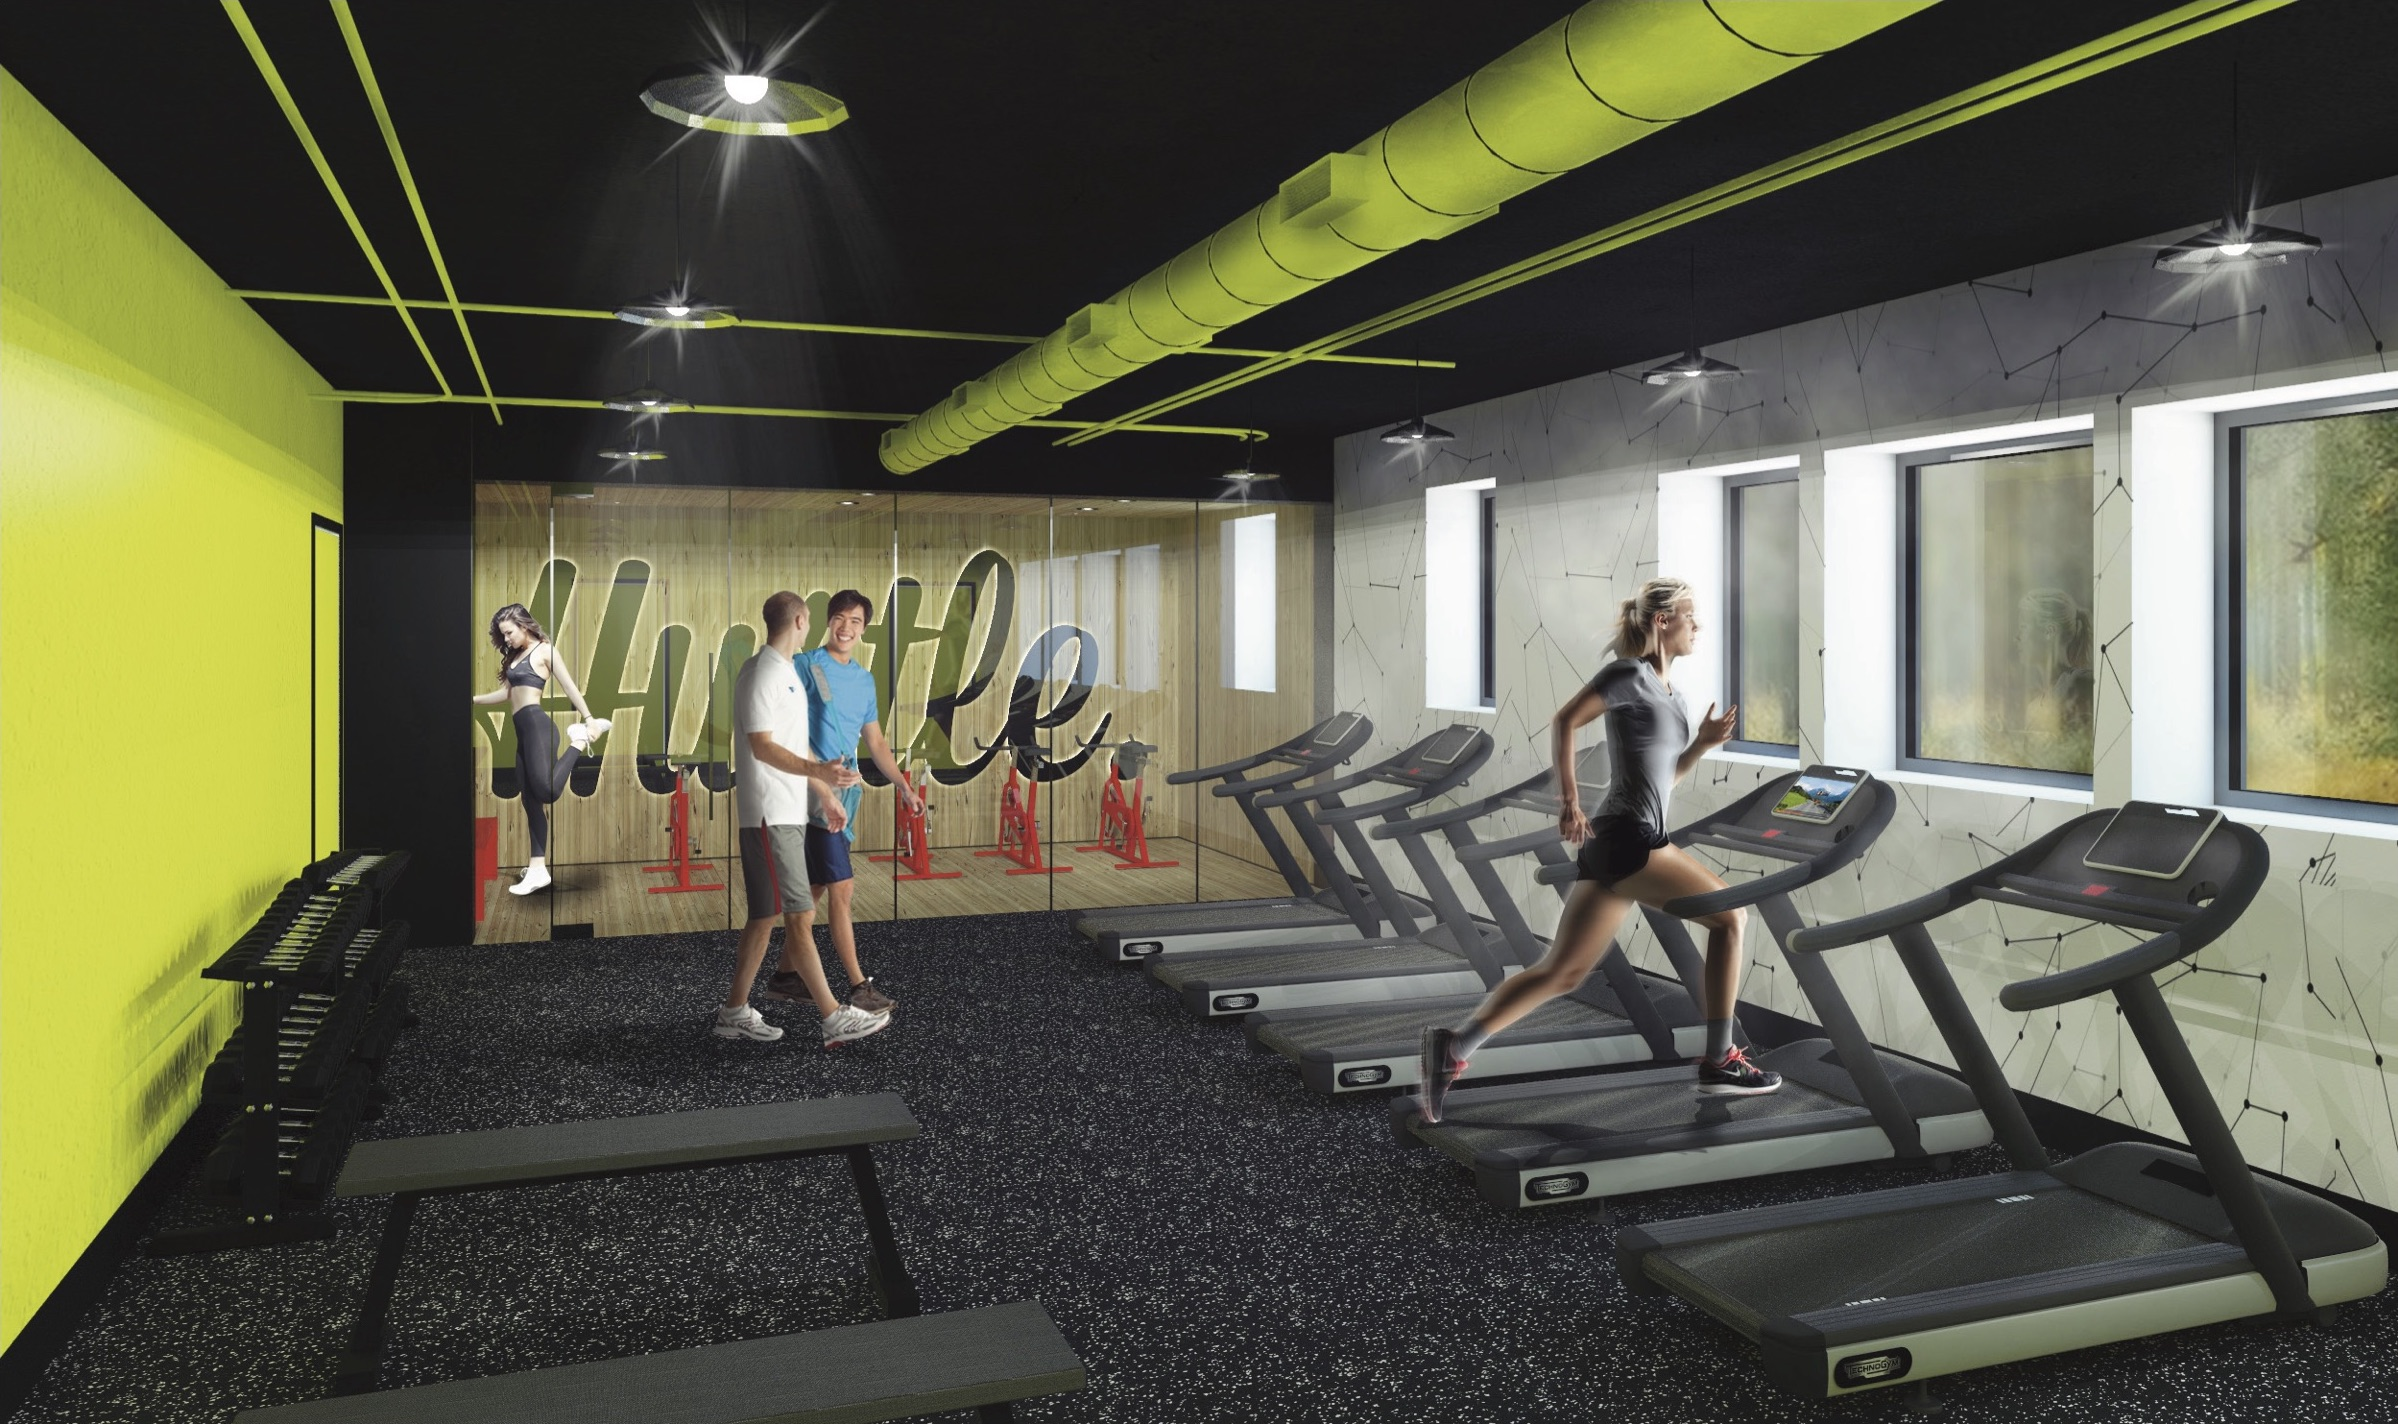 gym+interior+.jpg